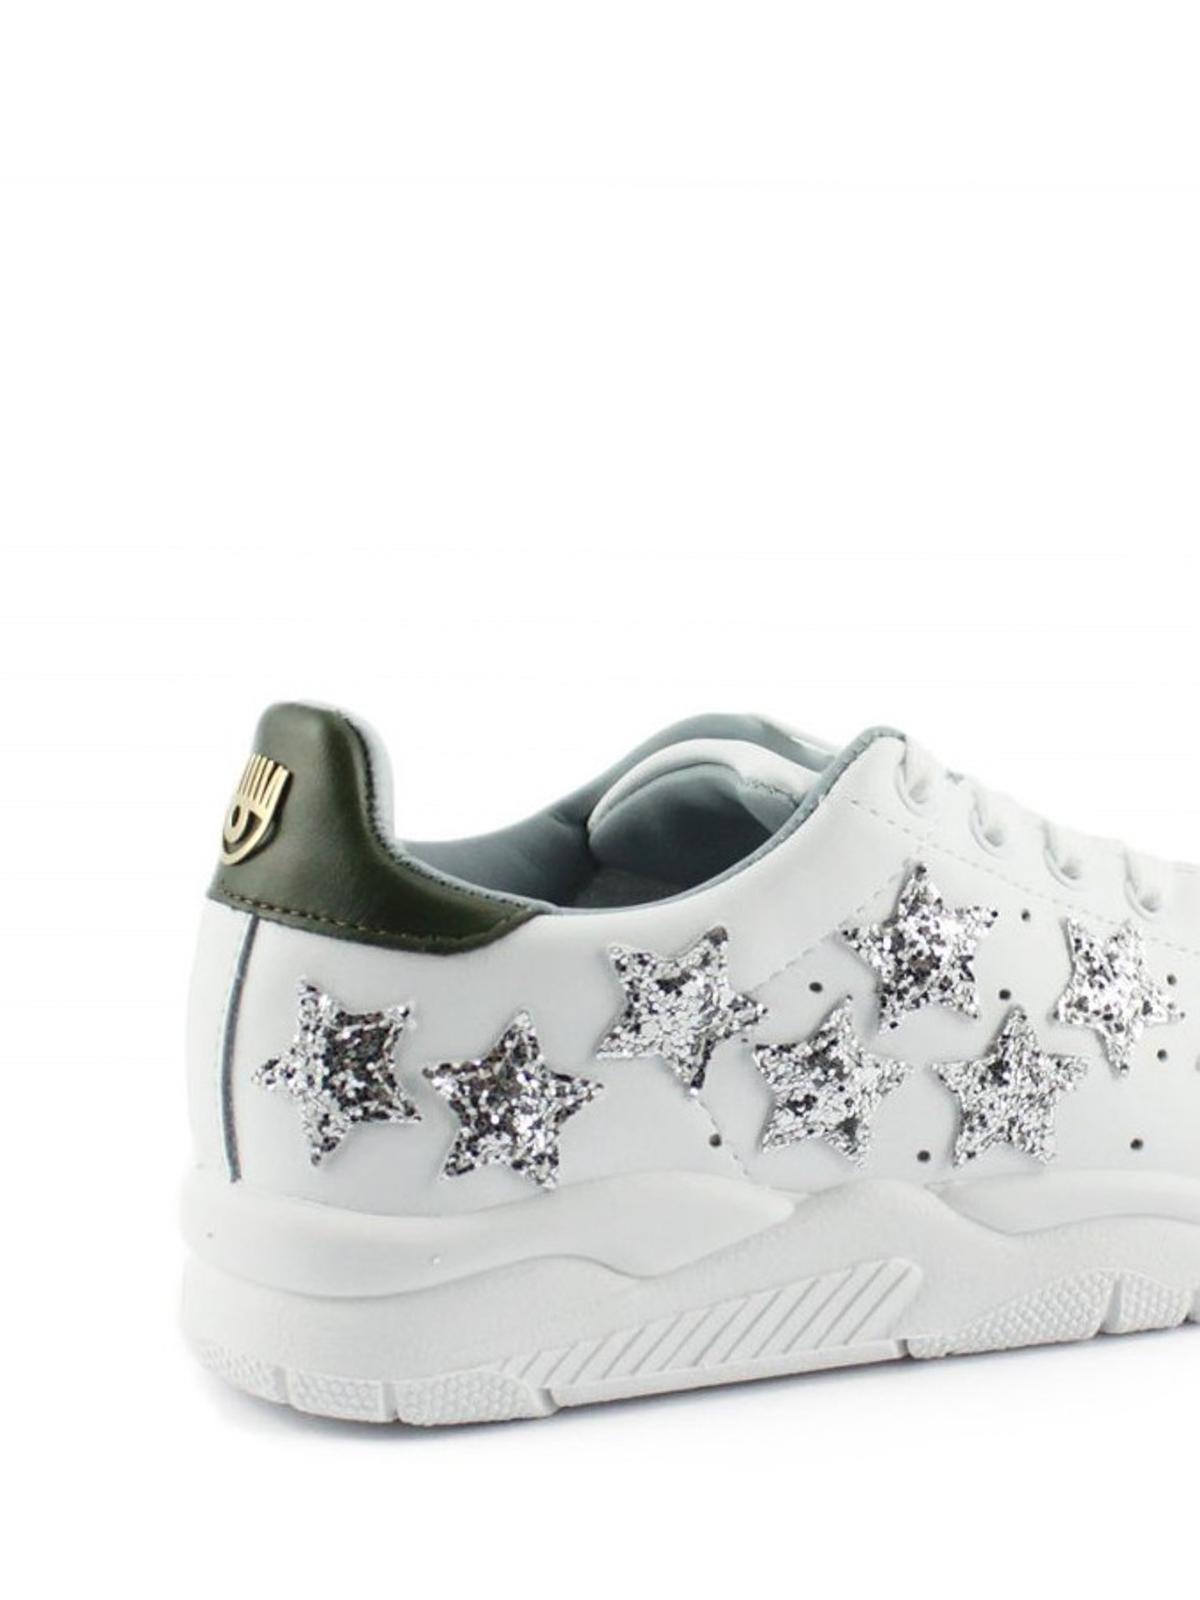 Sale Free Shipping Chiara Ferragni Glitter Star Sneakers Sale Countdown Package Clearance Release Dates 3yhec2W